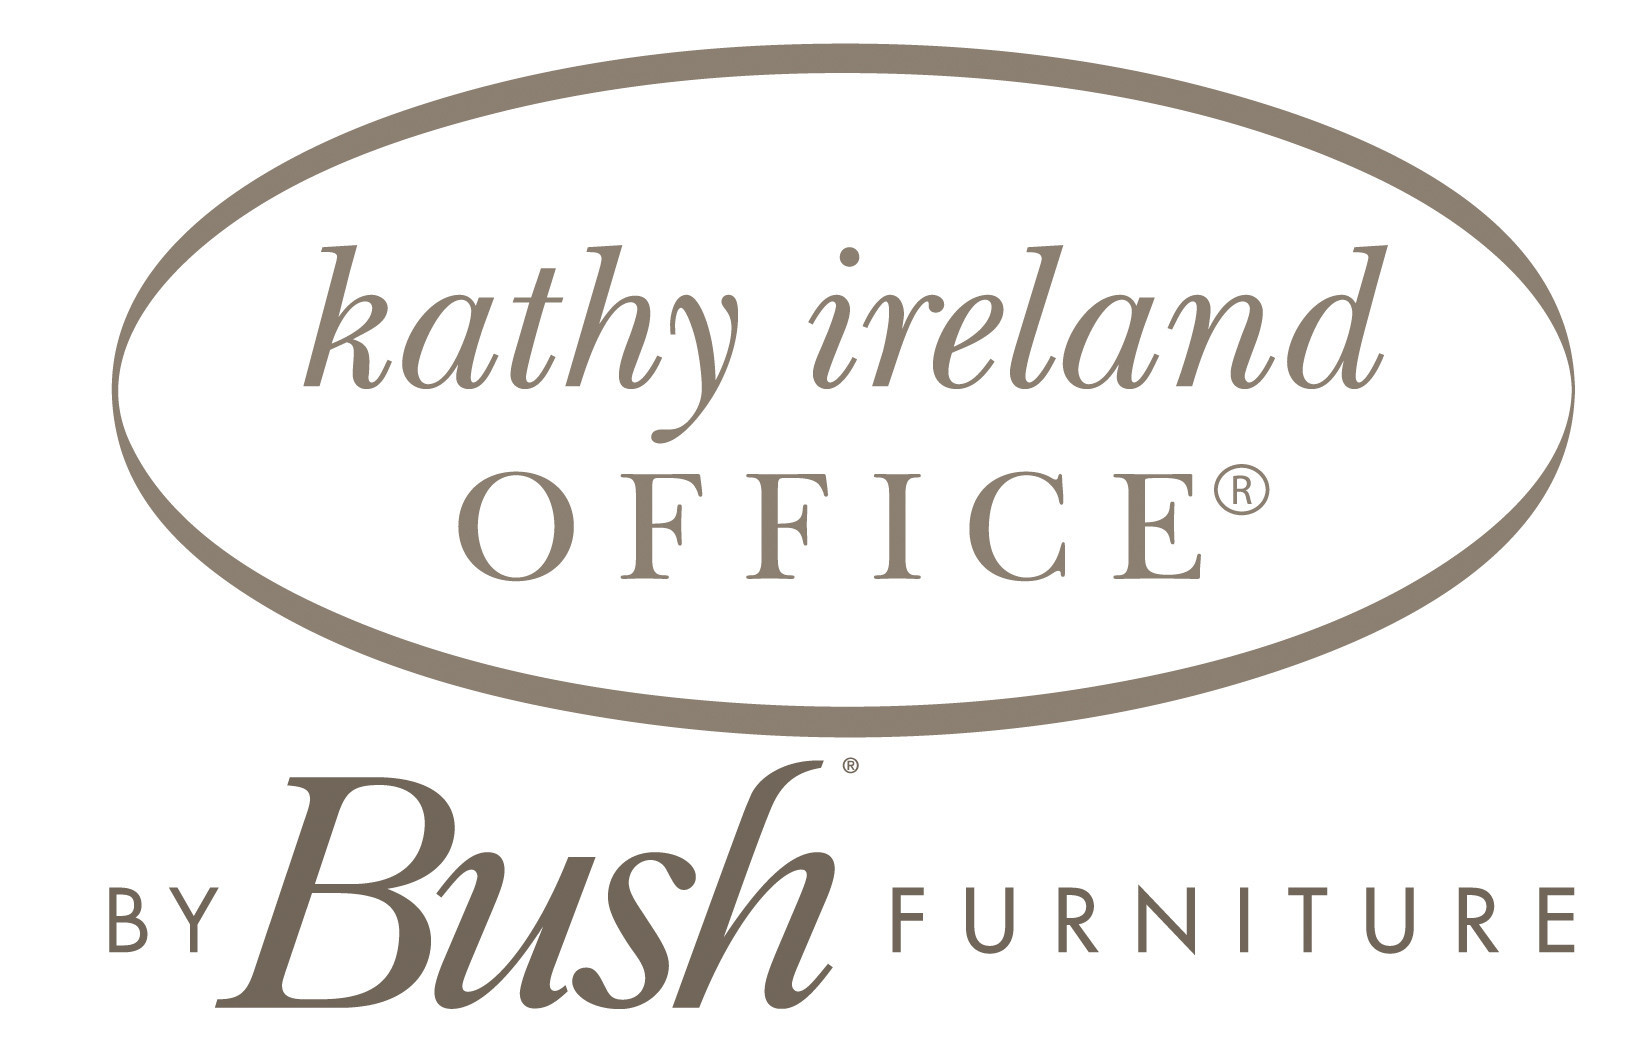 Kathy Ireland by Bush